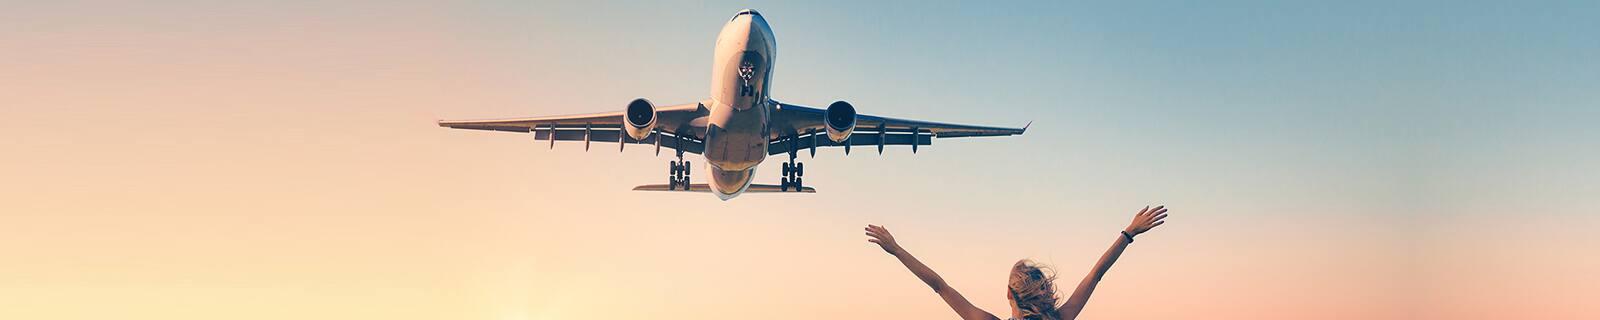 Roundtrip Airfare Offer